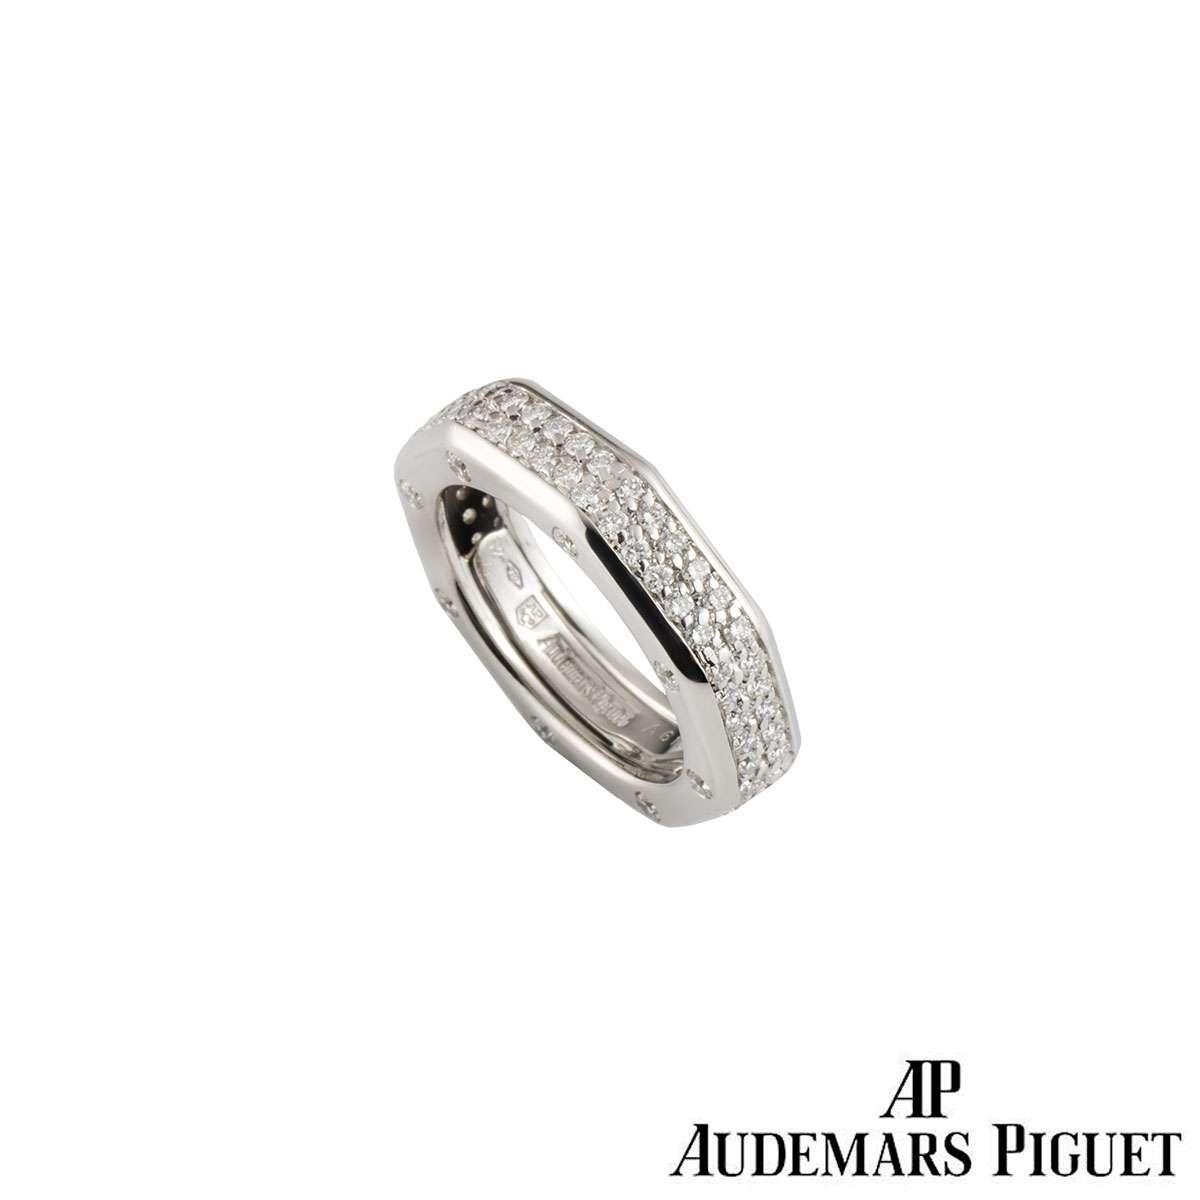 Audemars Piguet Diamond Set Royal Oak Ring